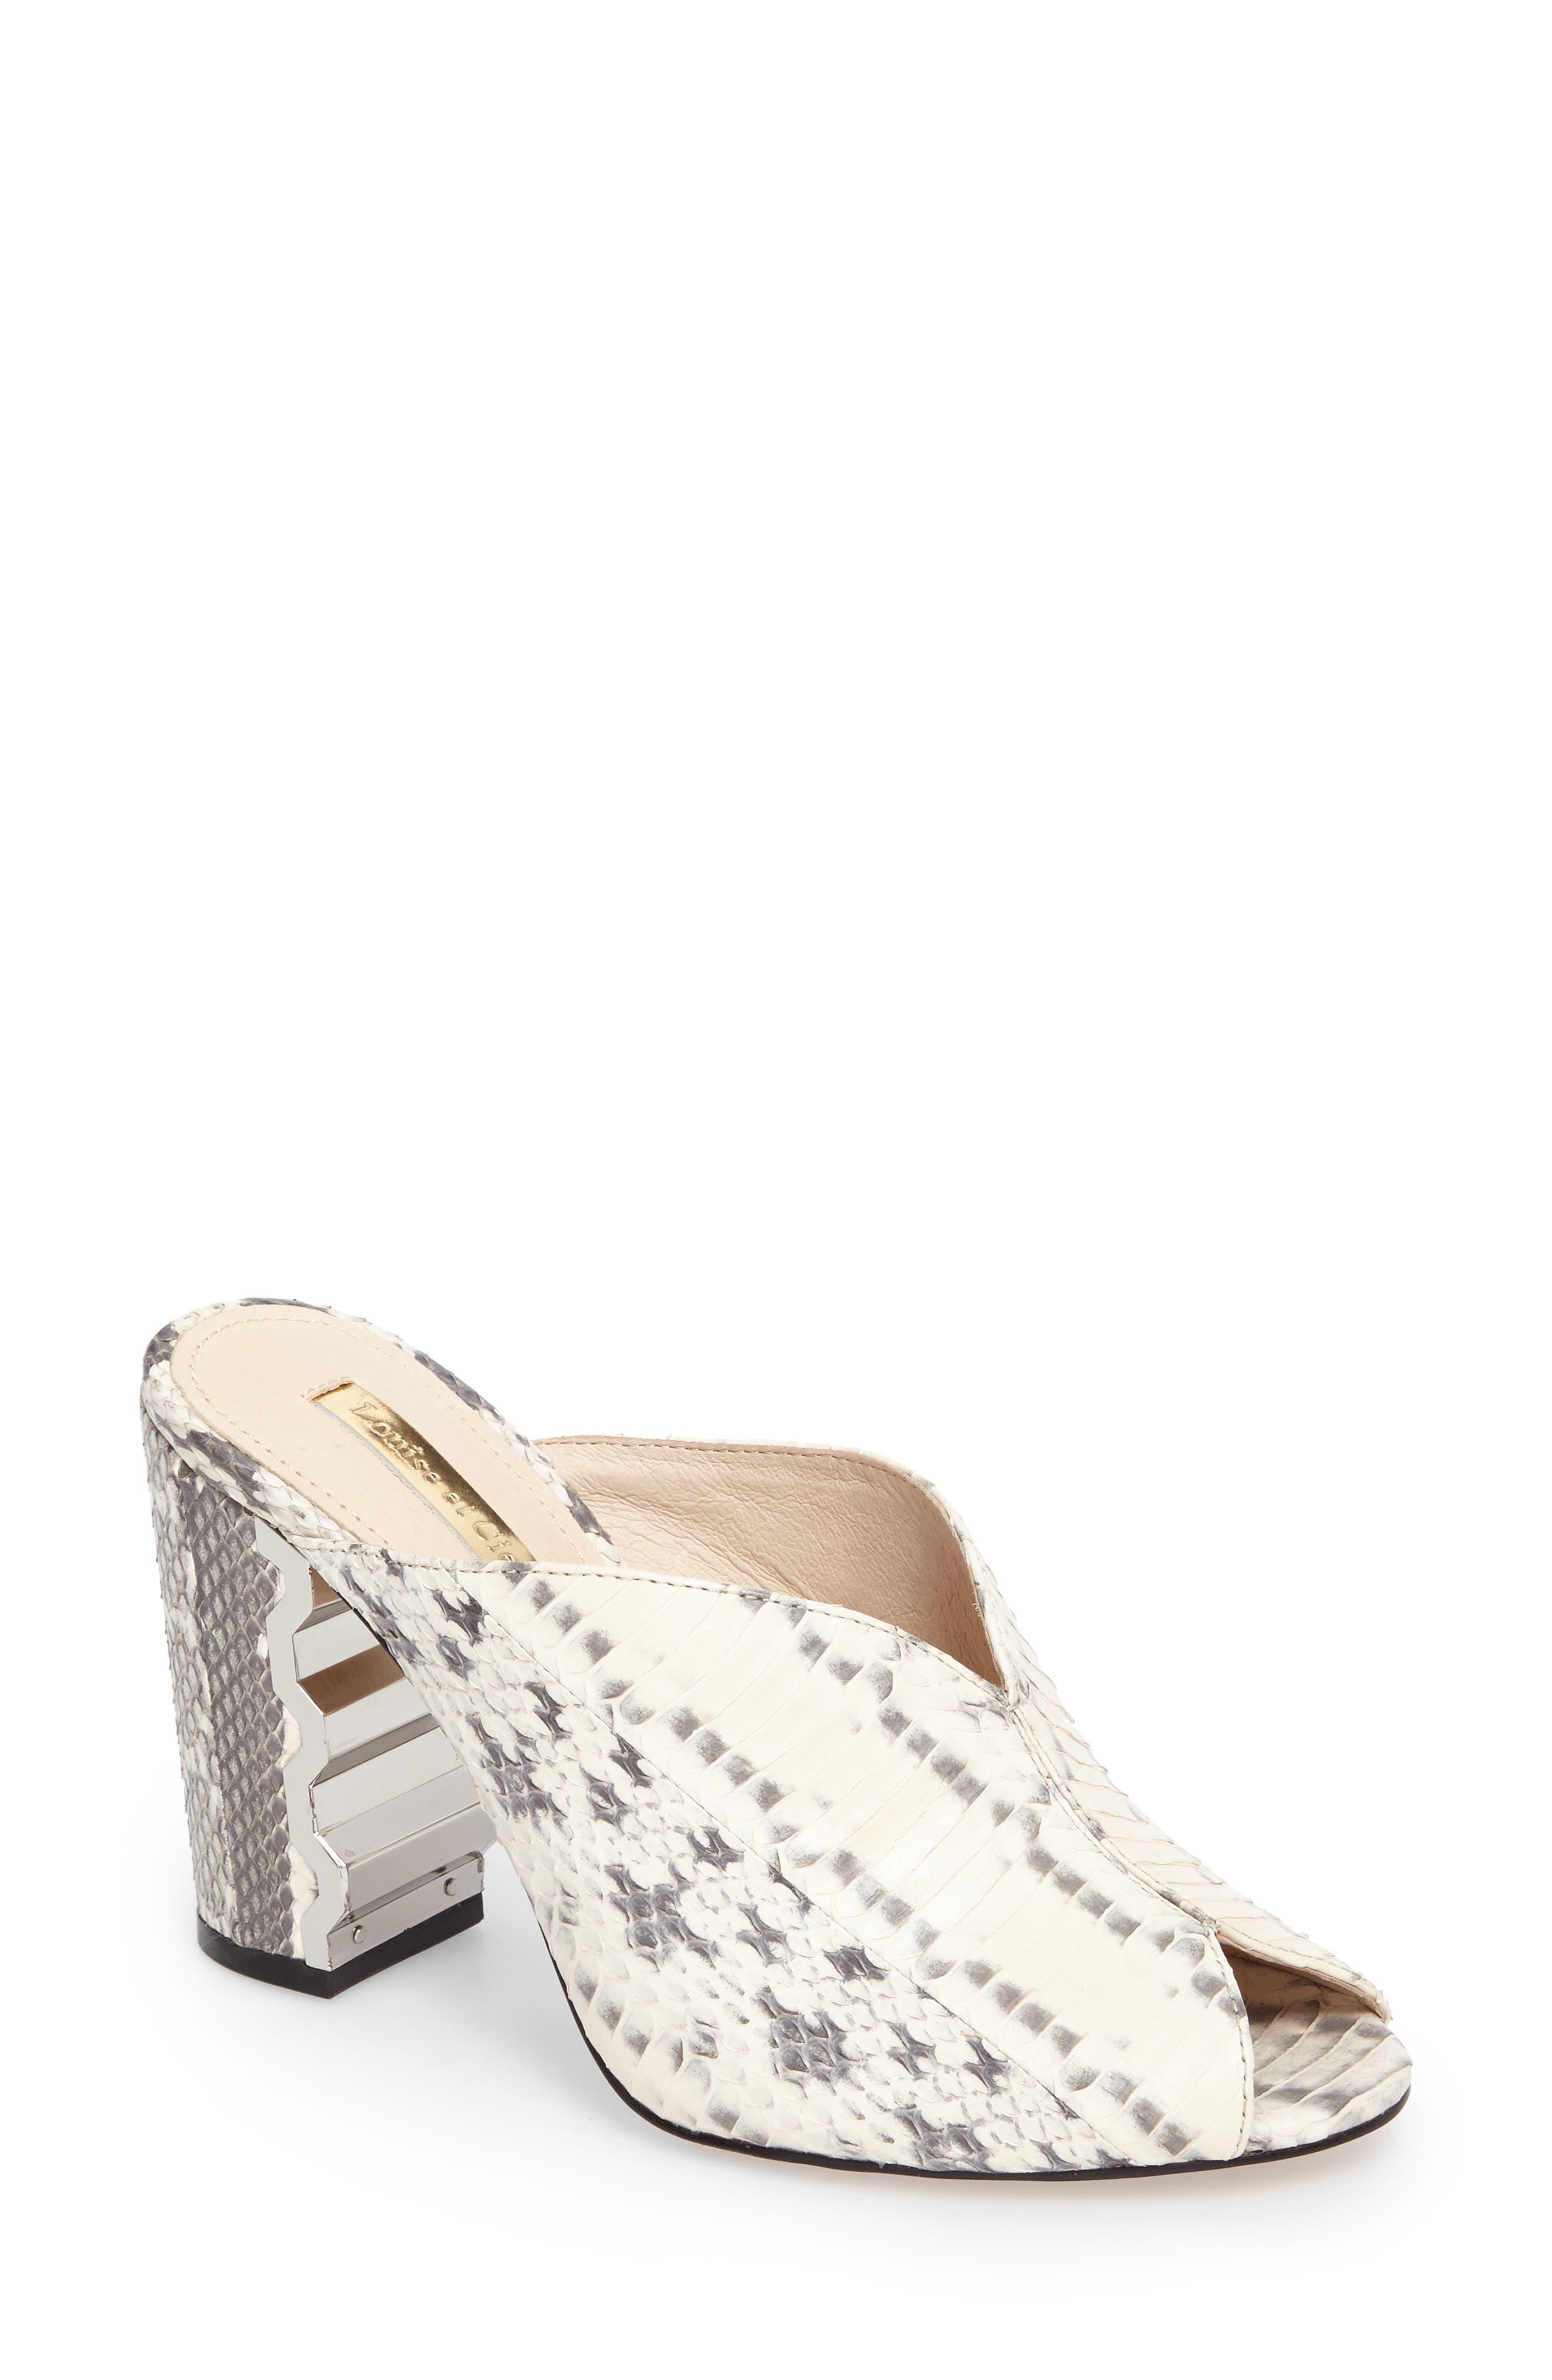 Korella II Block Heel Mule,                         Main,                         color, Black/ White Leather